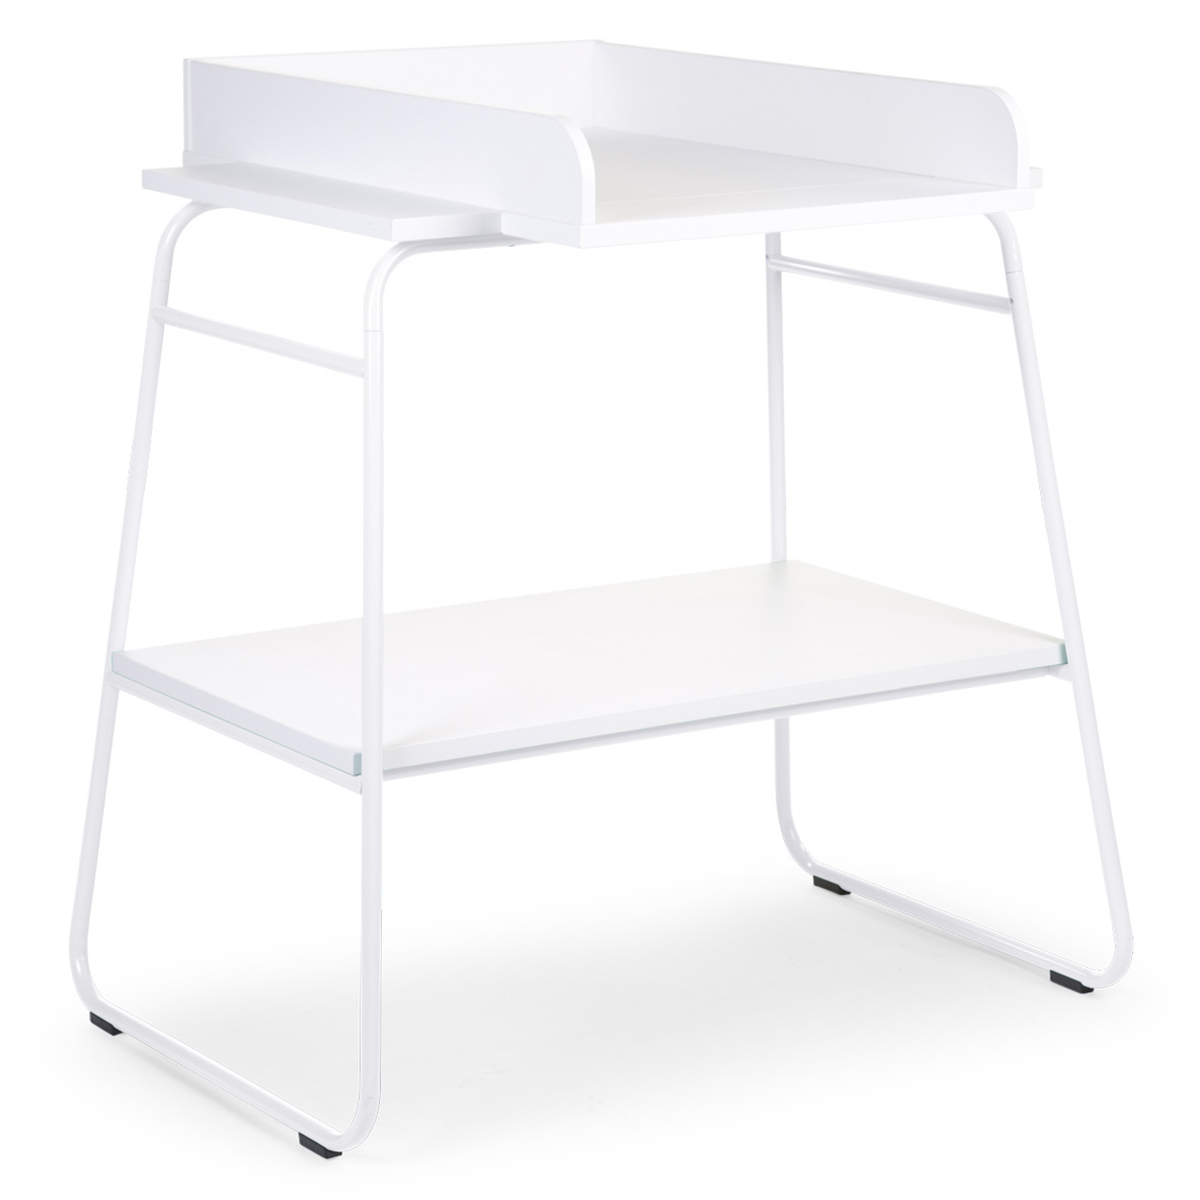 Table à langer Table à Langer Ironwood Large - Blanc Table à Langer Ironwood Large - Blanc